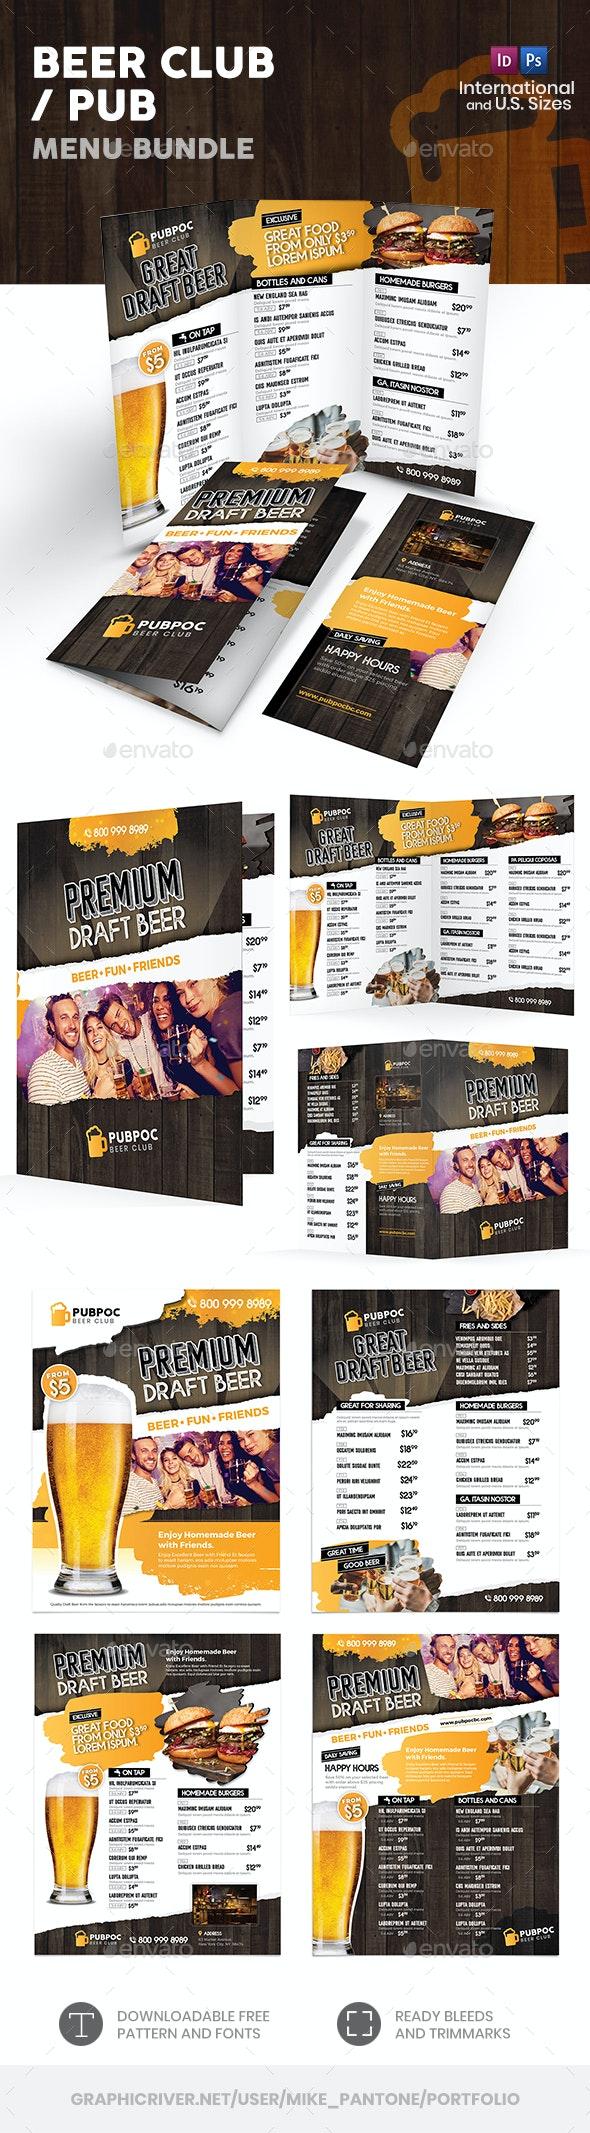 Beer Club / Pub Menu Print Bundle - Food Menus Print Templates